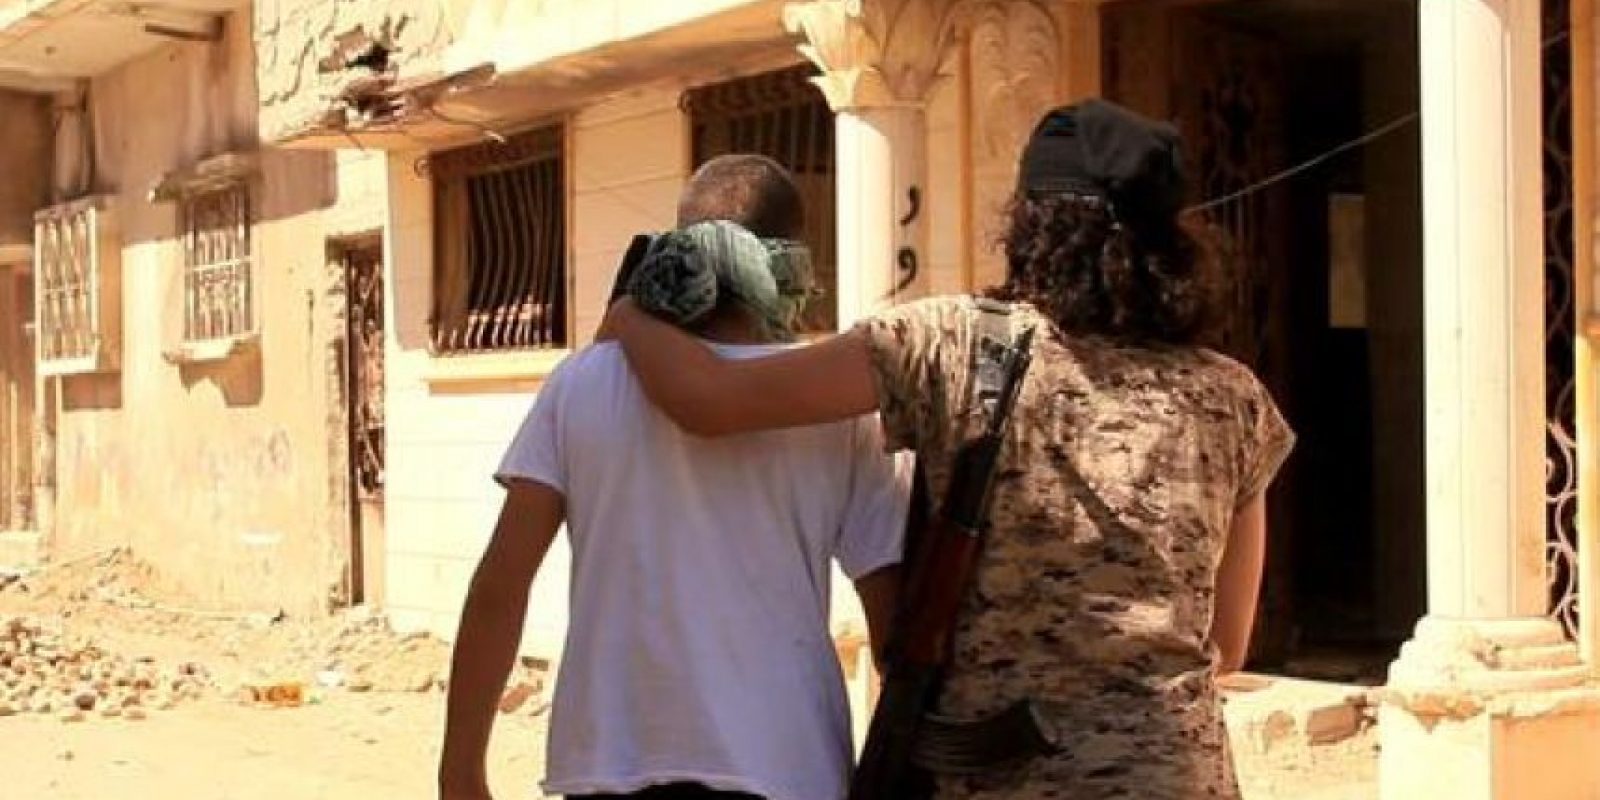 Este es el abrazo de la muerte que le dan a sus víctimas Foto:Twitter.com/raqqa_mcr